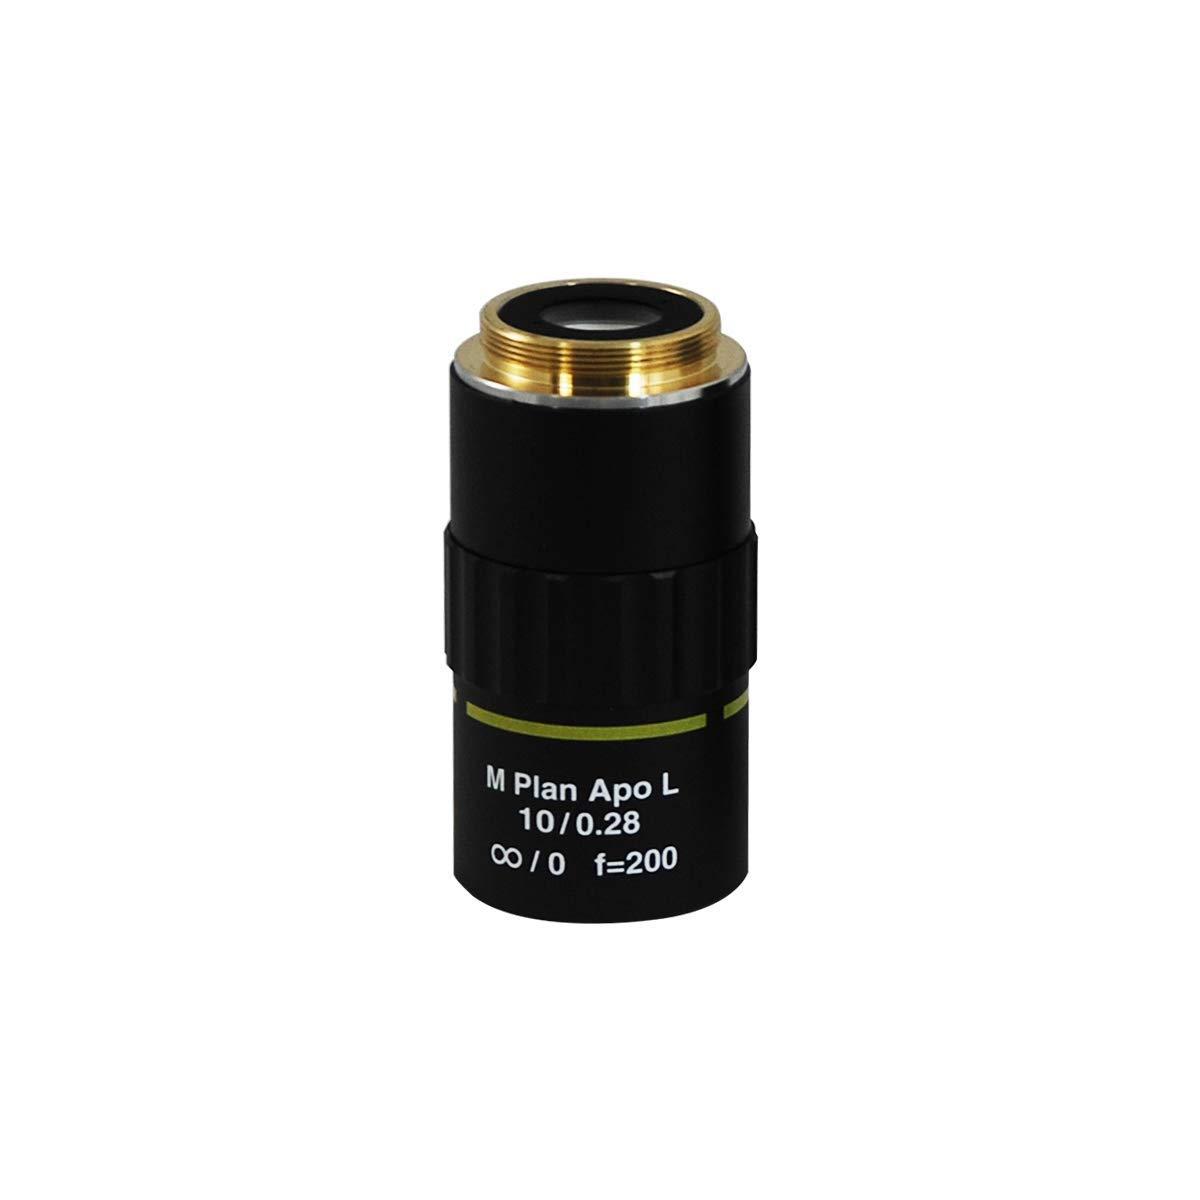 BoliOptics 10倍 無限遠焦点 (M Plan Apo L) アポクロマティック 金属顕微鏡 対物レンズ 作動距離 34mm MT06033341   B078JLGWYK